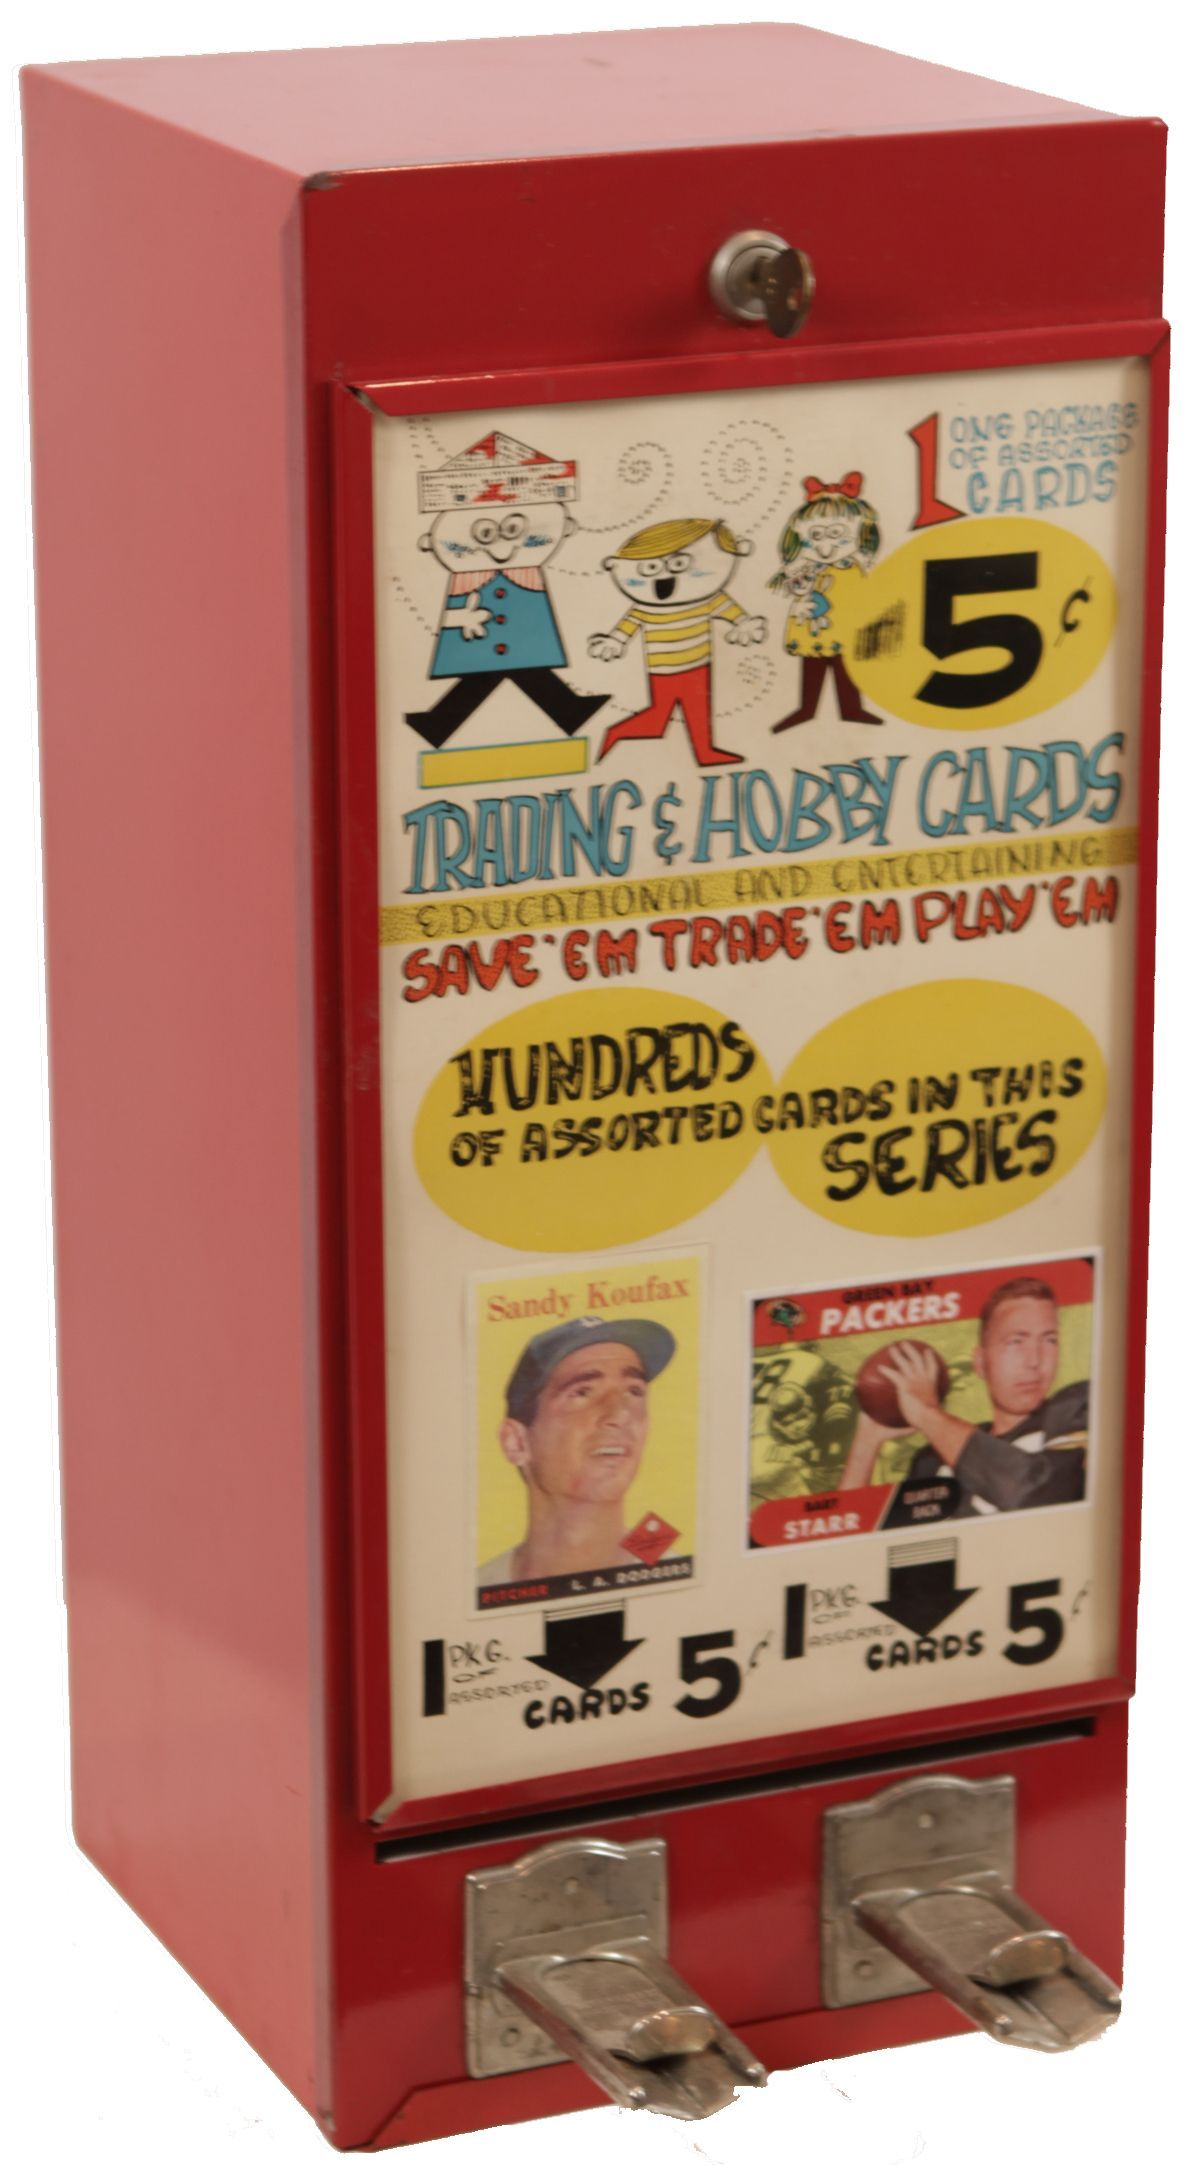 how to swipe a card on a vending machine